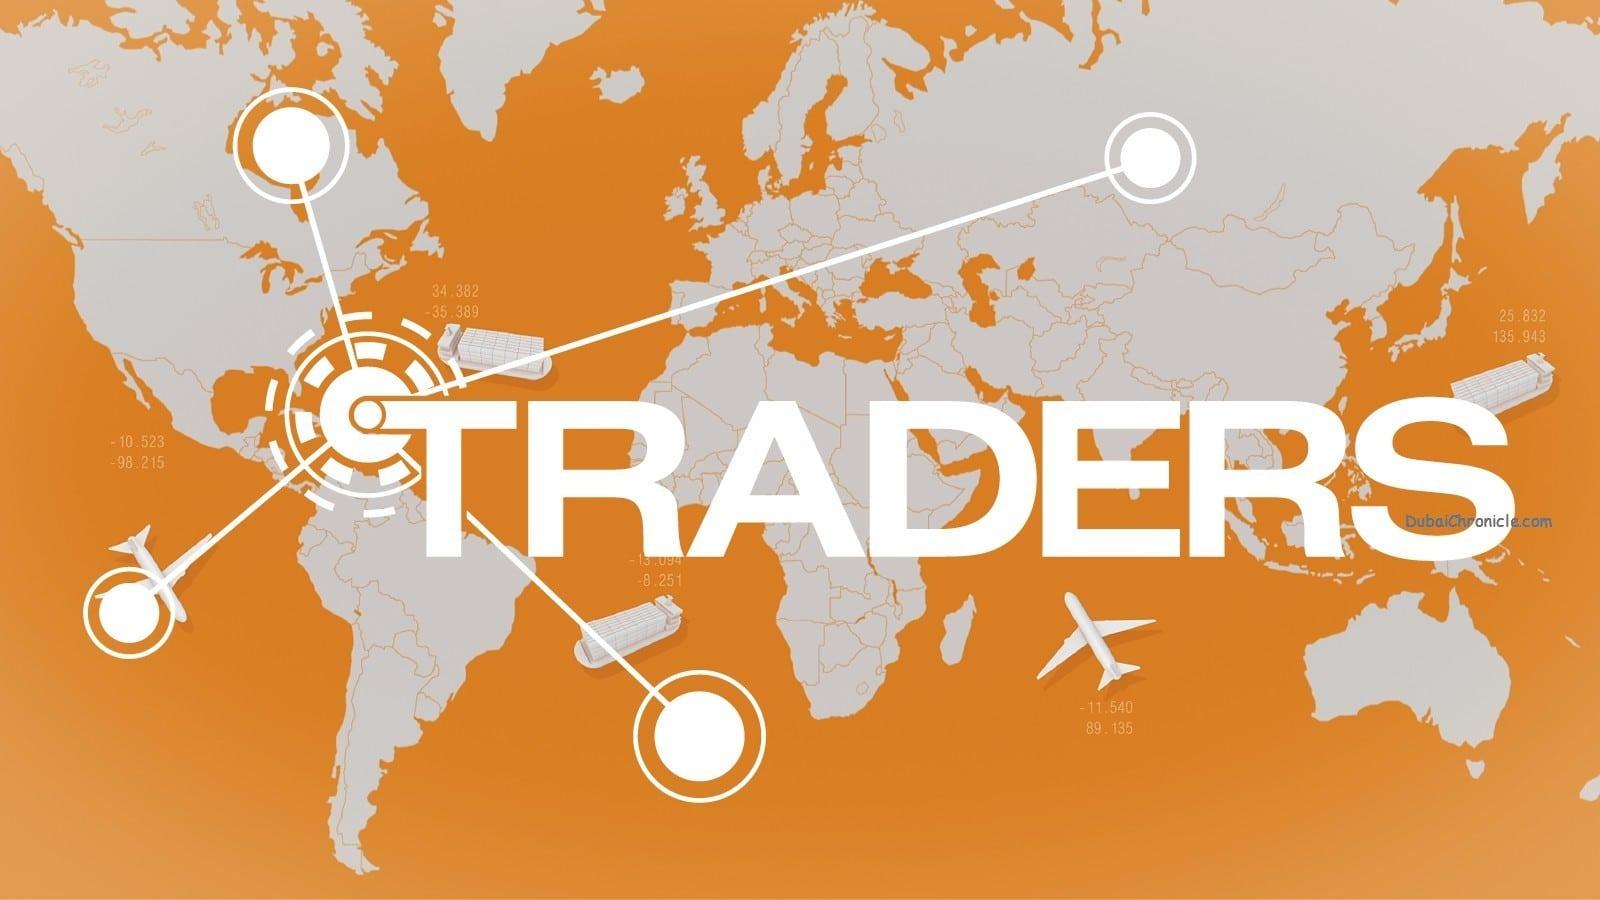 Traders - Card